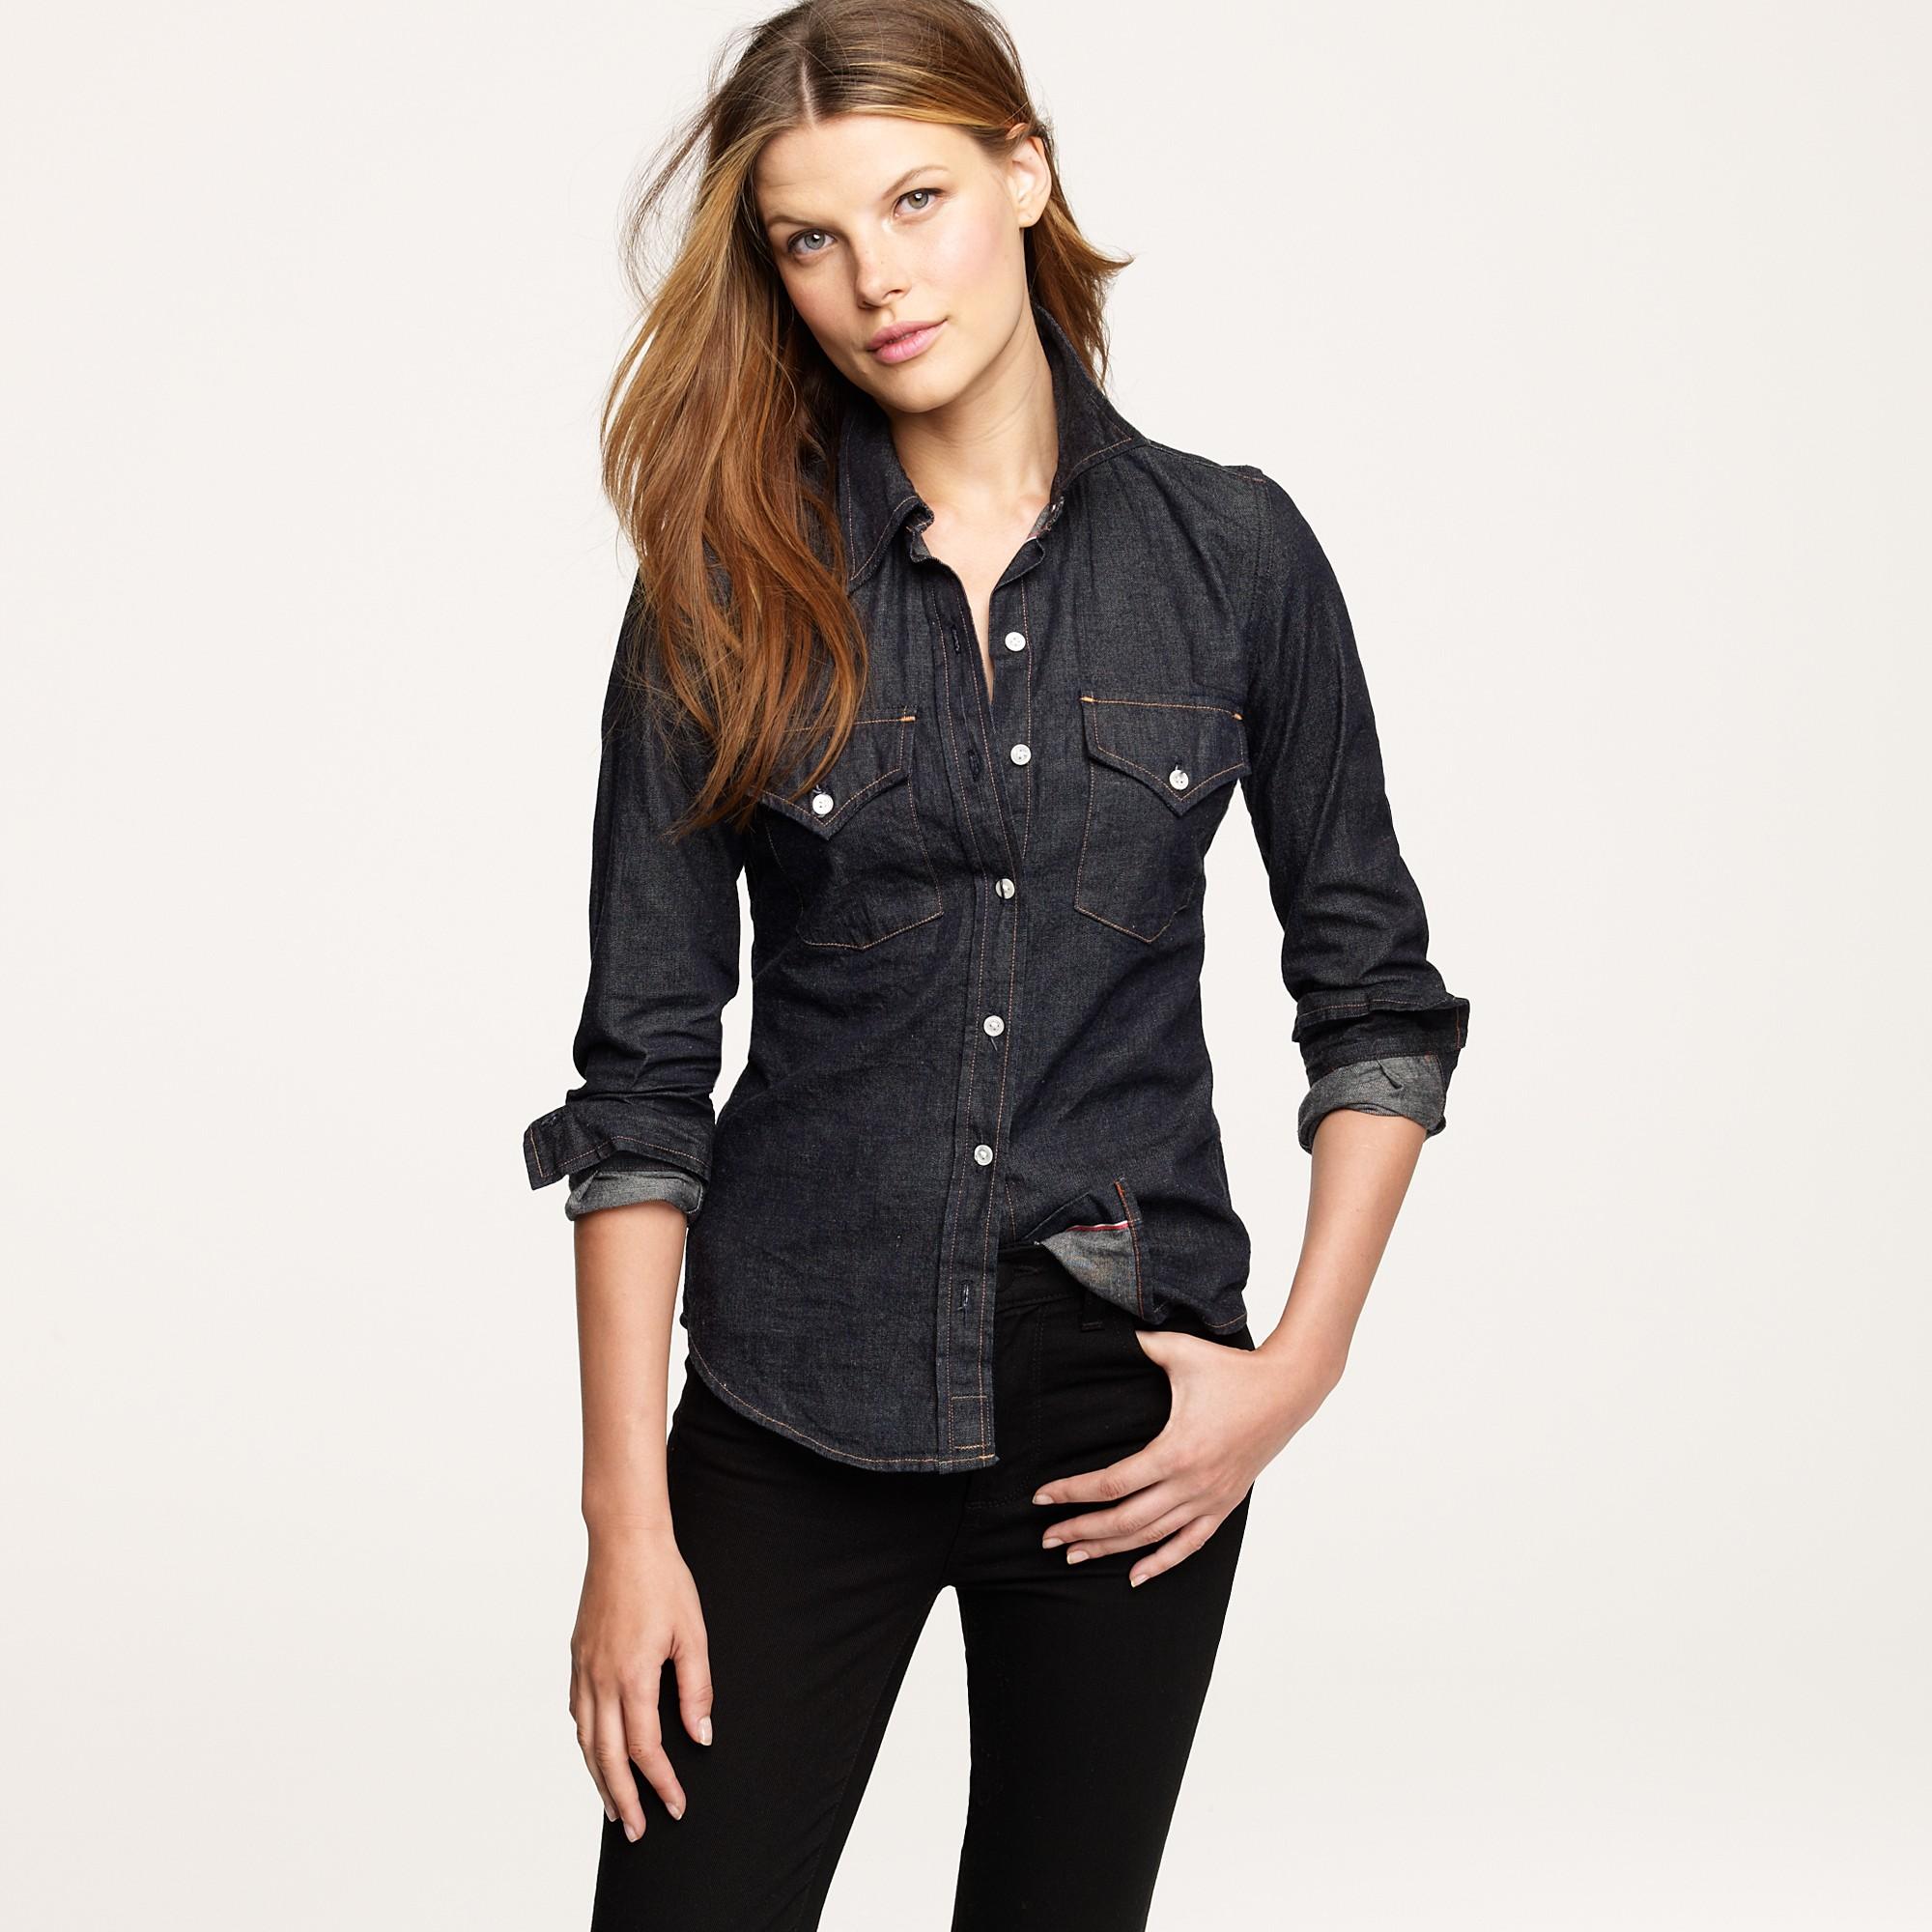 black jean shirt womens